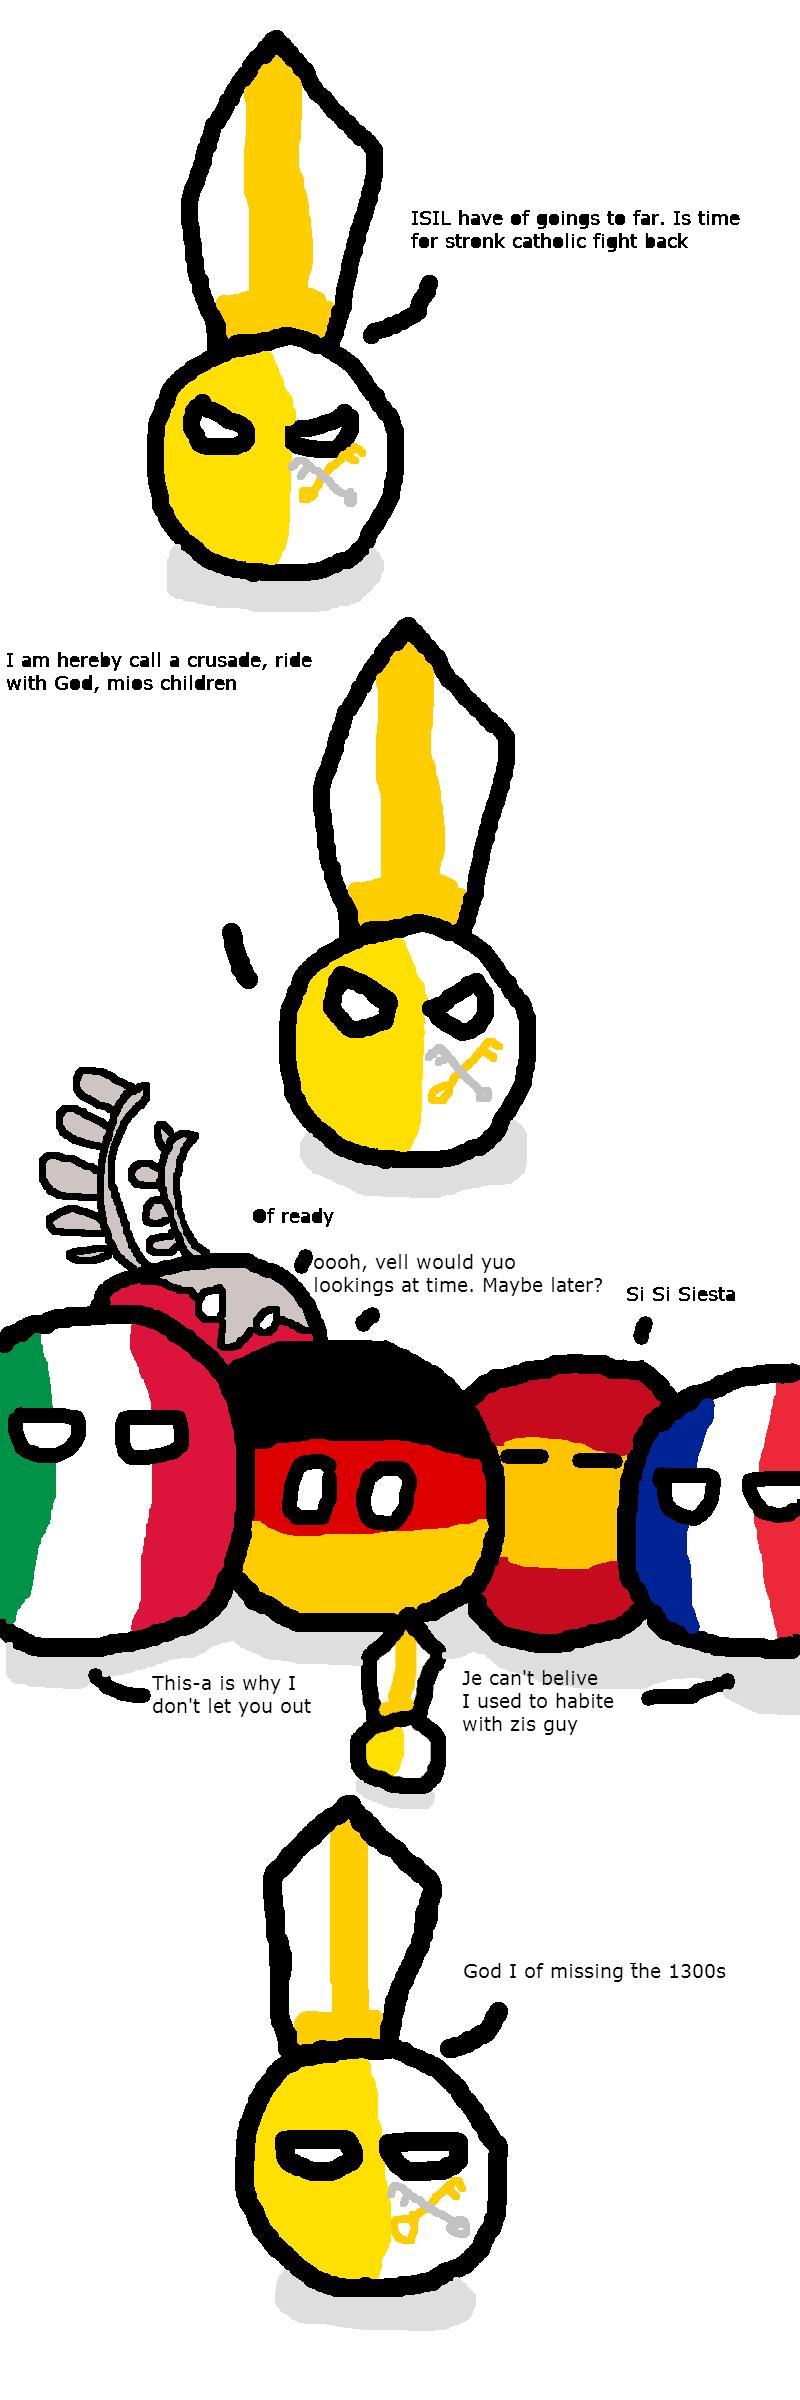 The wrong era